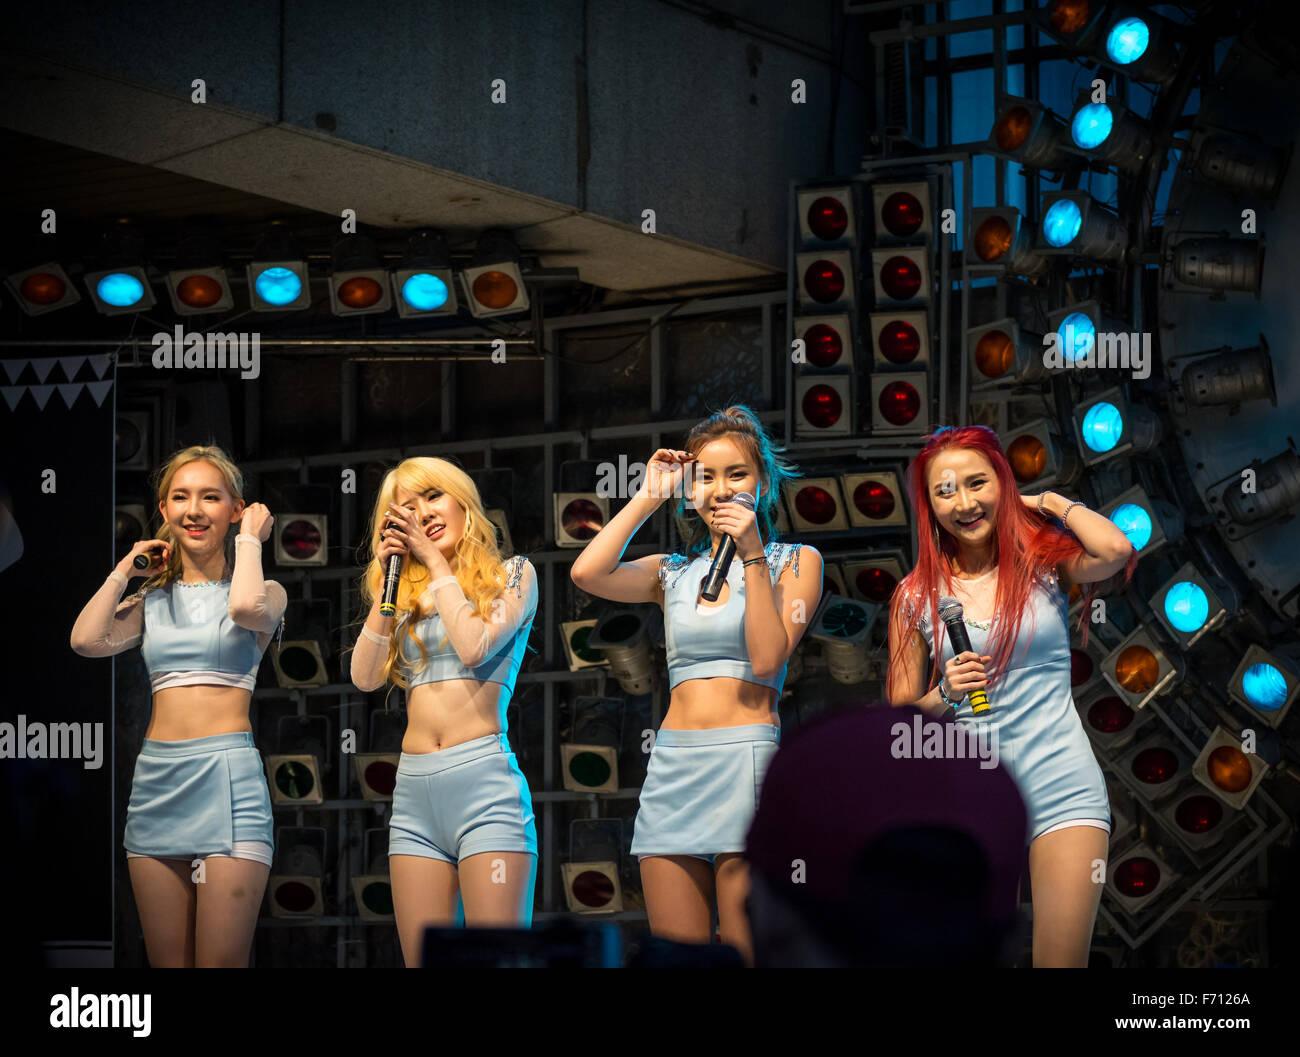 Korean KPOP Cover band Ace at the kpop cover festival in Dongdaemun, Seoul, South Korea - Stock Image